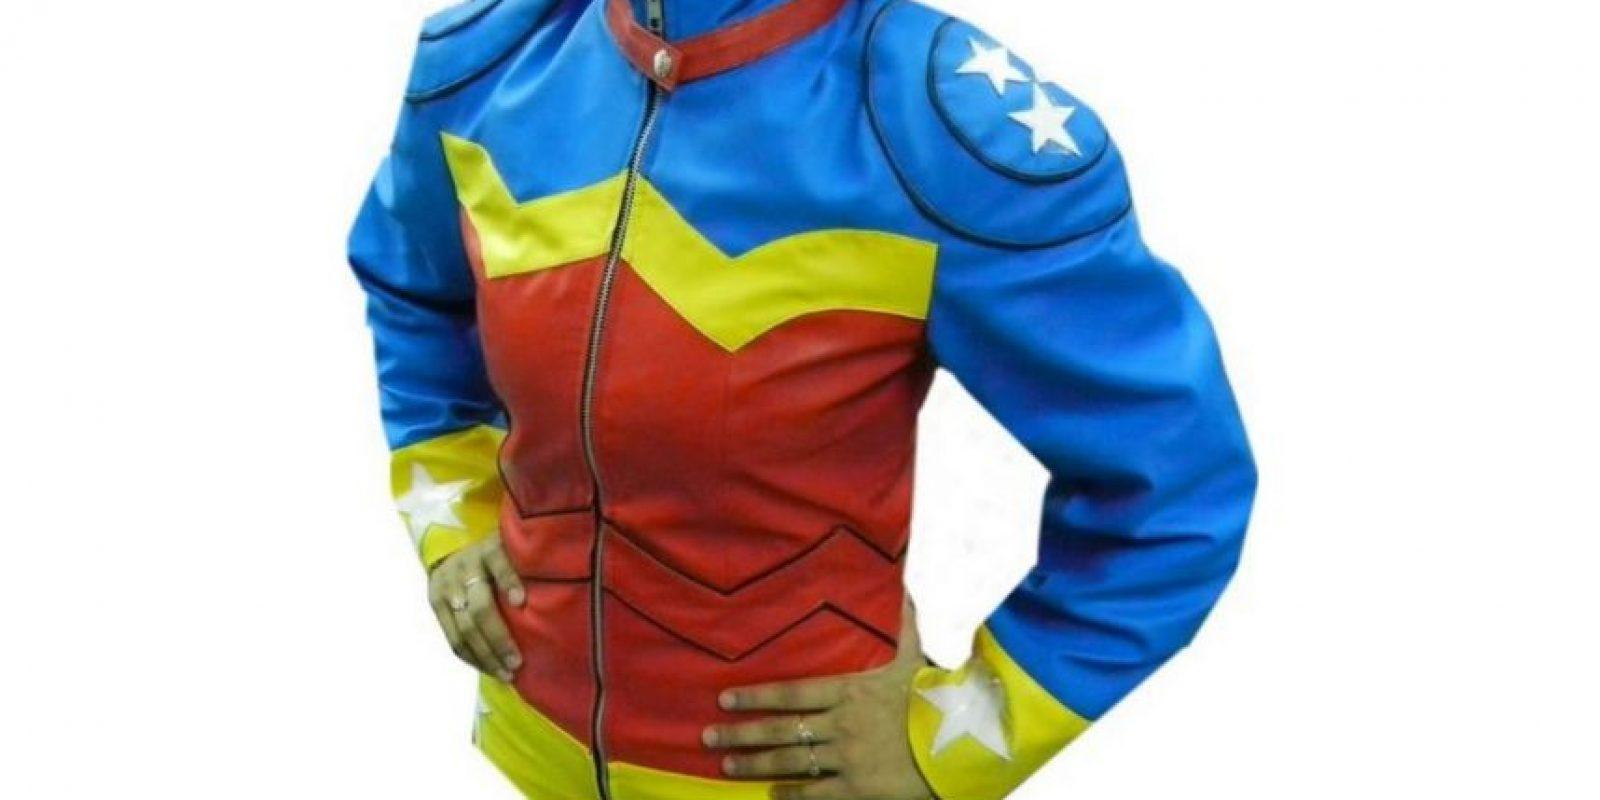 Mujer Maravilla Foto:galleryhip.com/wonder-woman-jacket.html